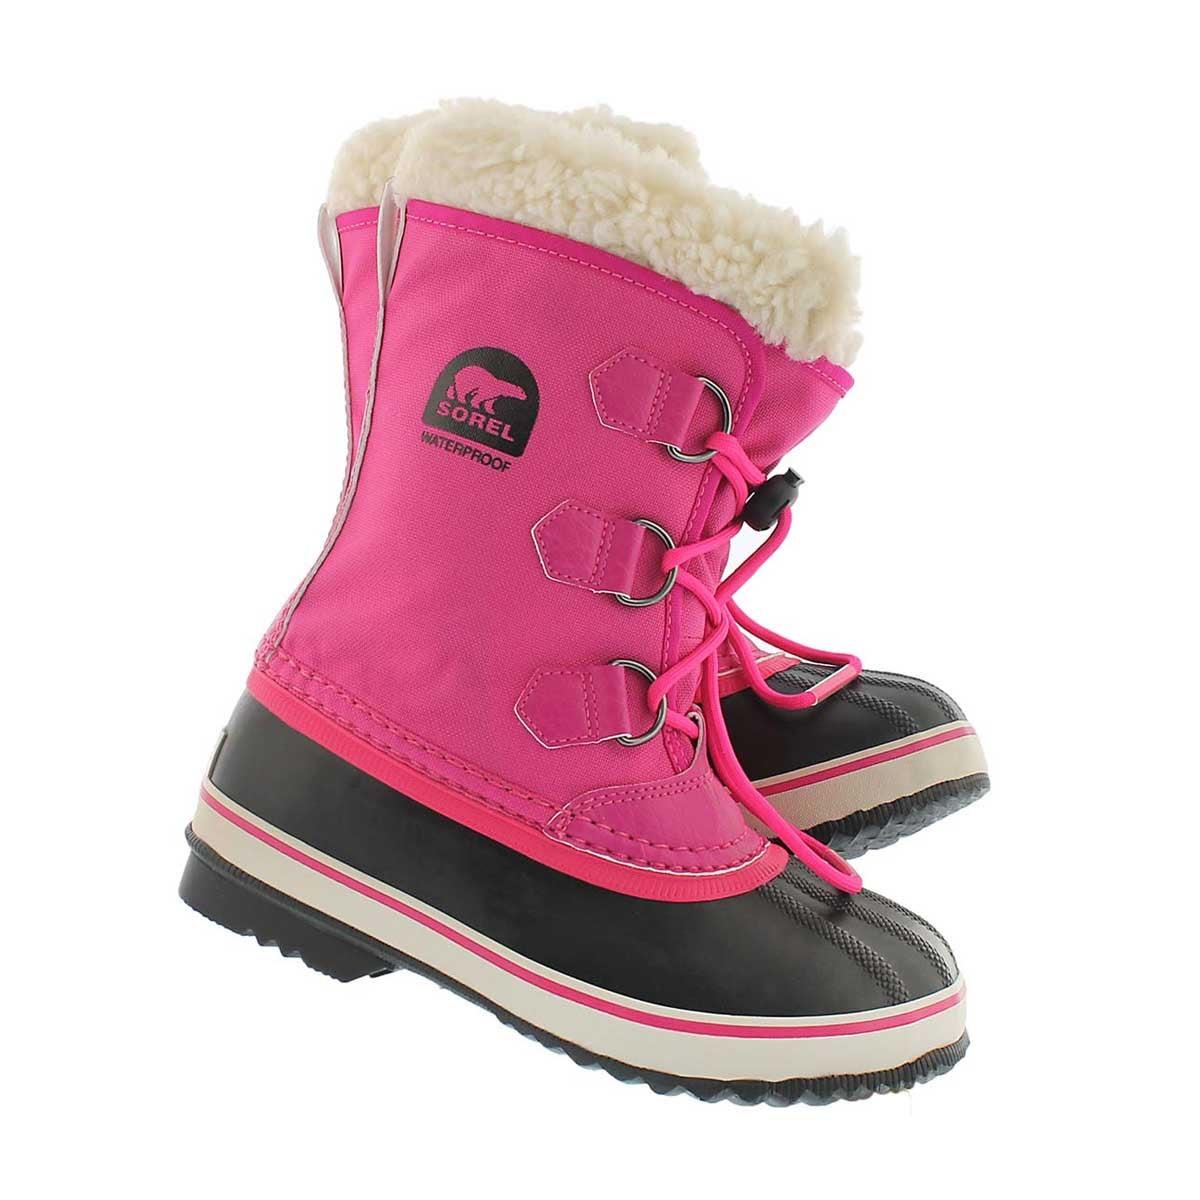 Sorel Pink Snow Boots | Homewood Mountain Ski Resort